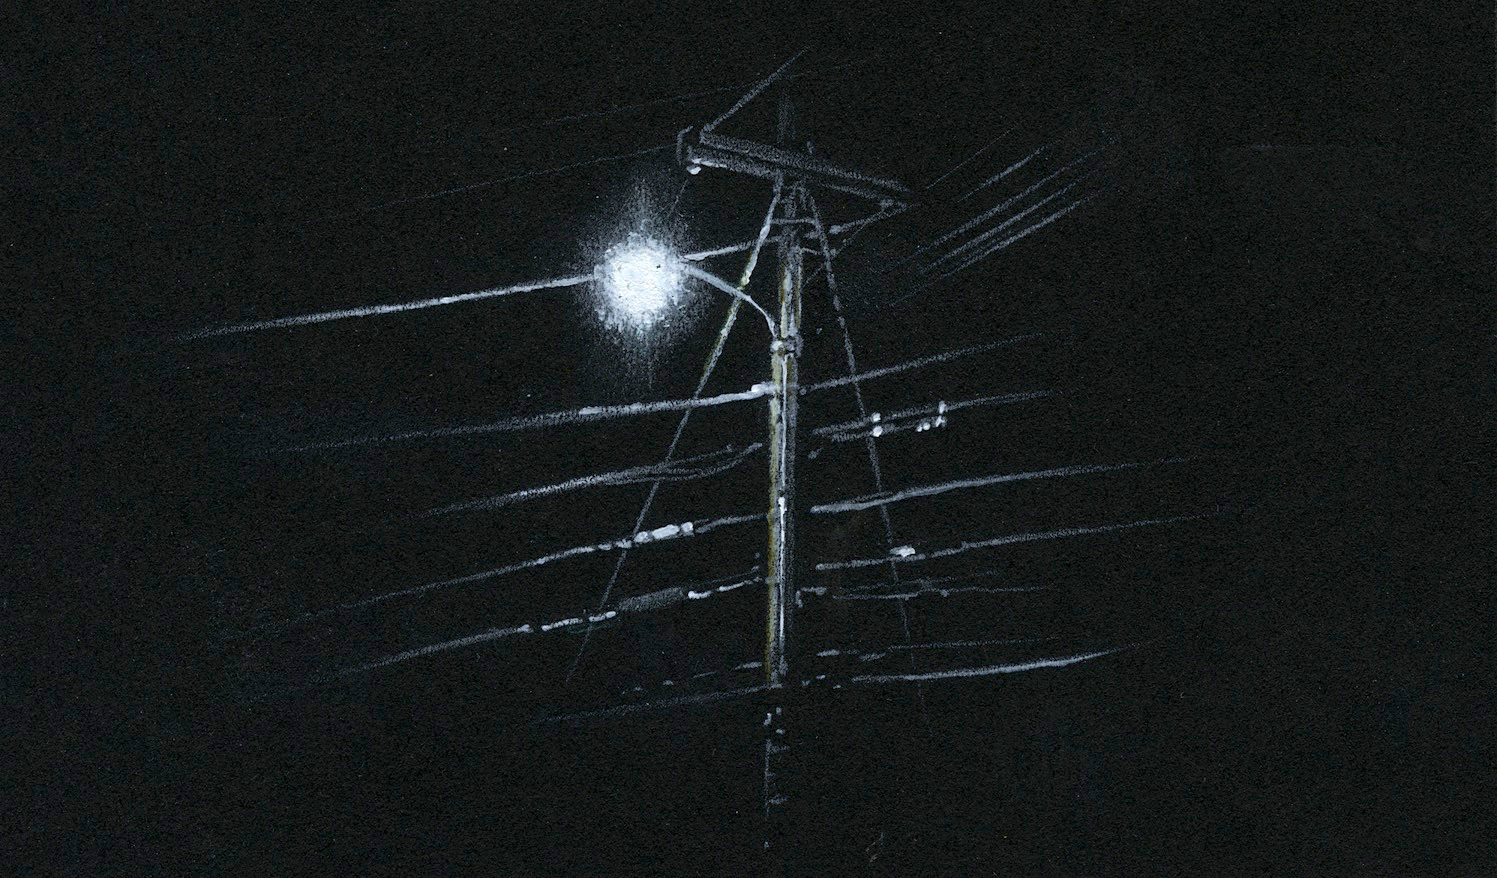 JACOB GUZAN  - Peoria, IL   Nightlight 3   colored pencil, white charcoal, acrylic, SOLD